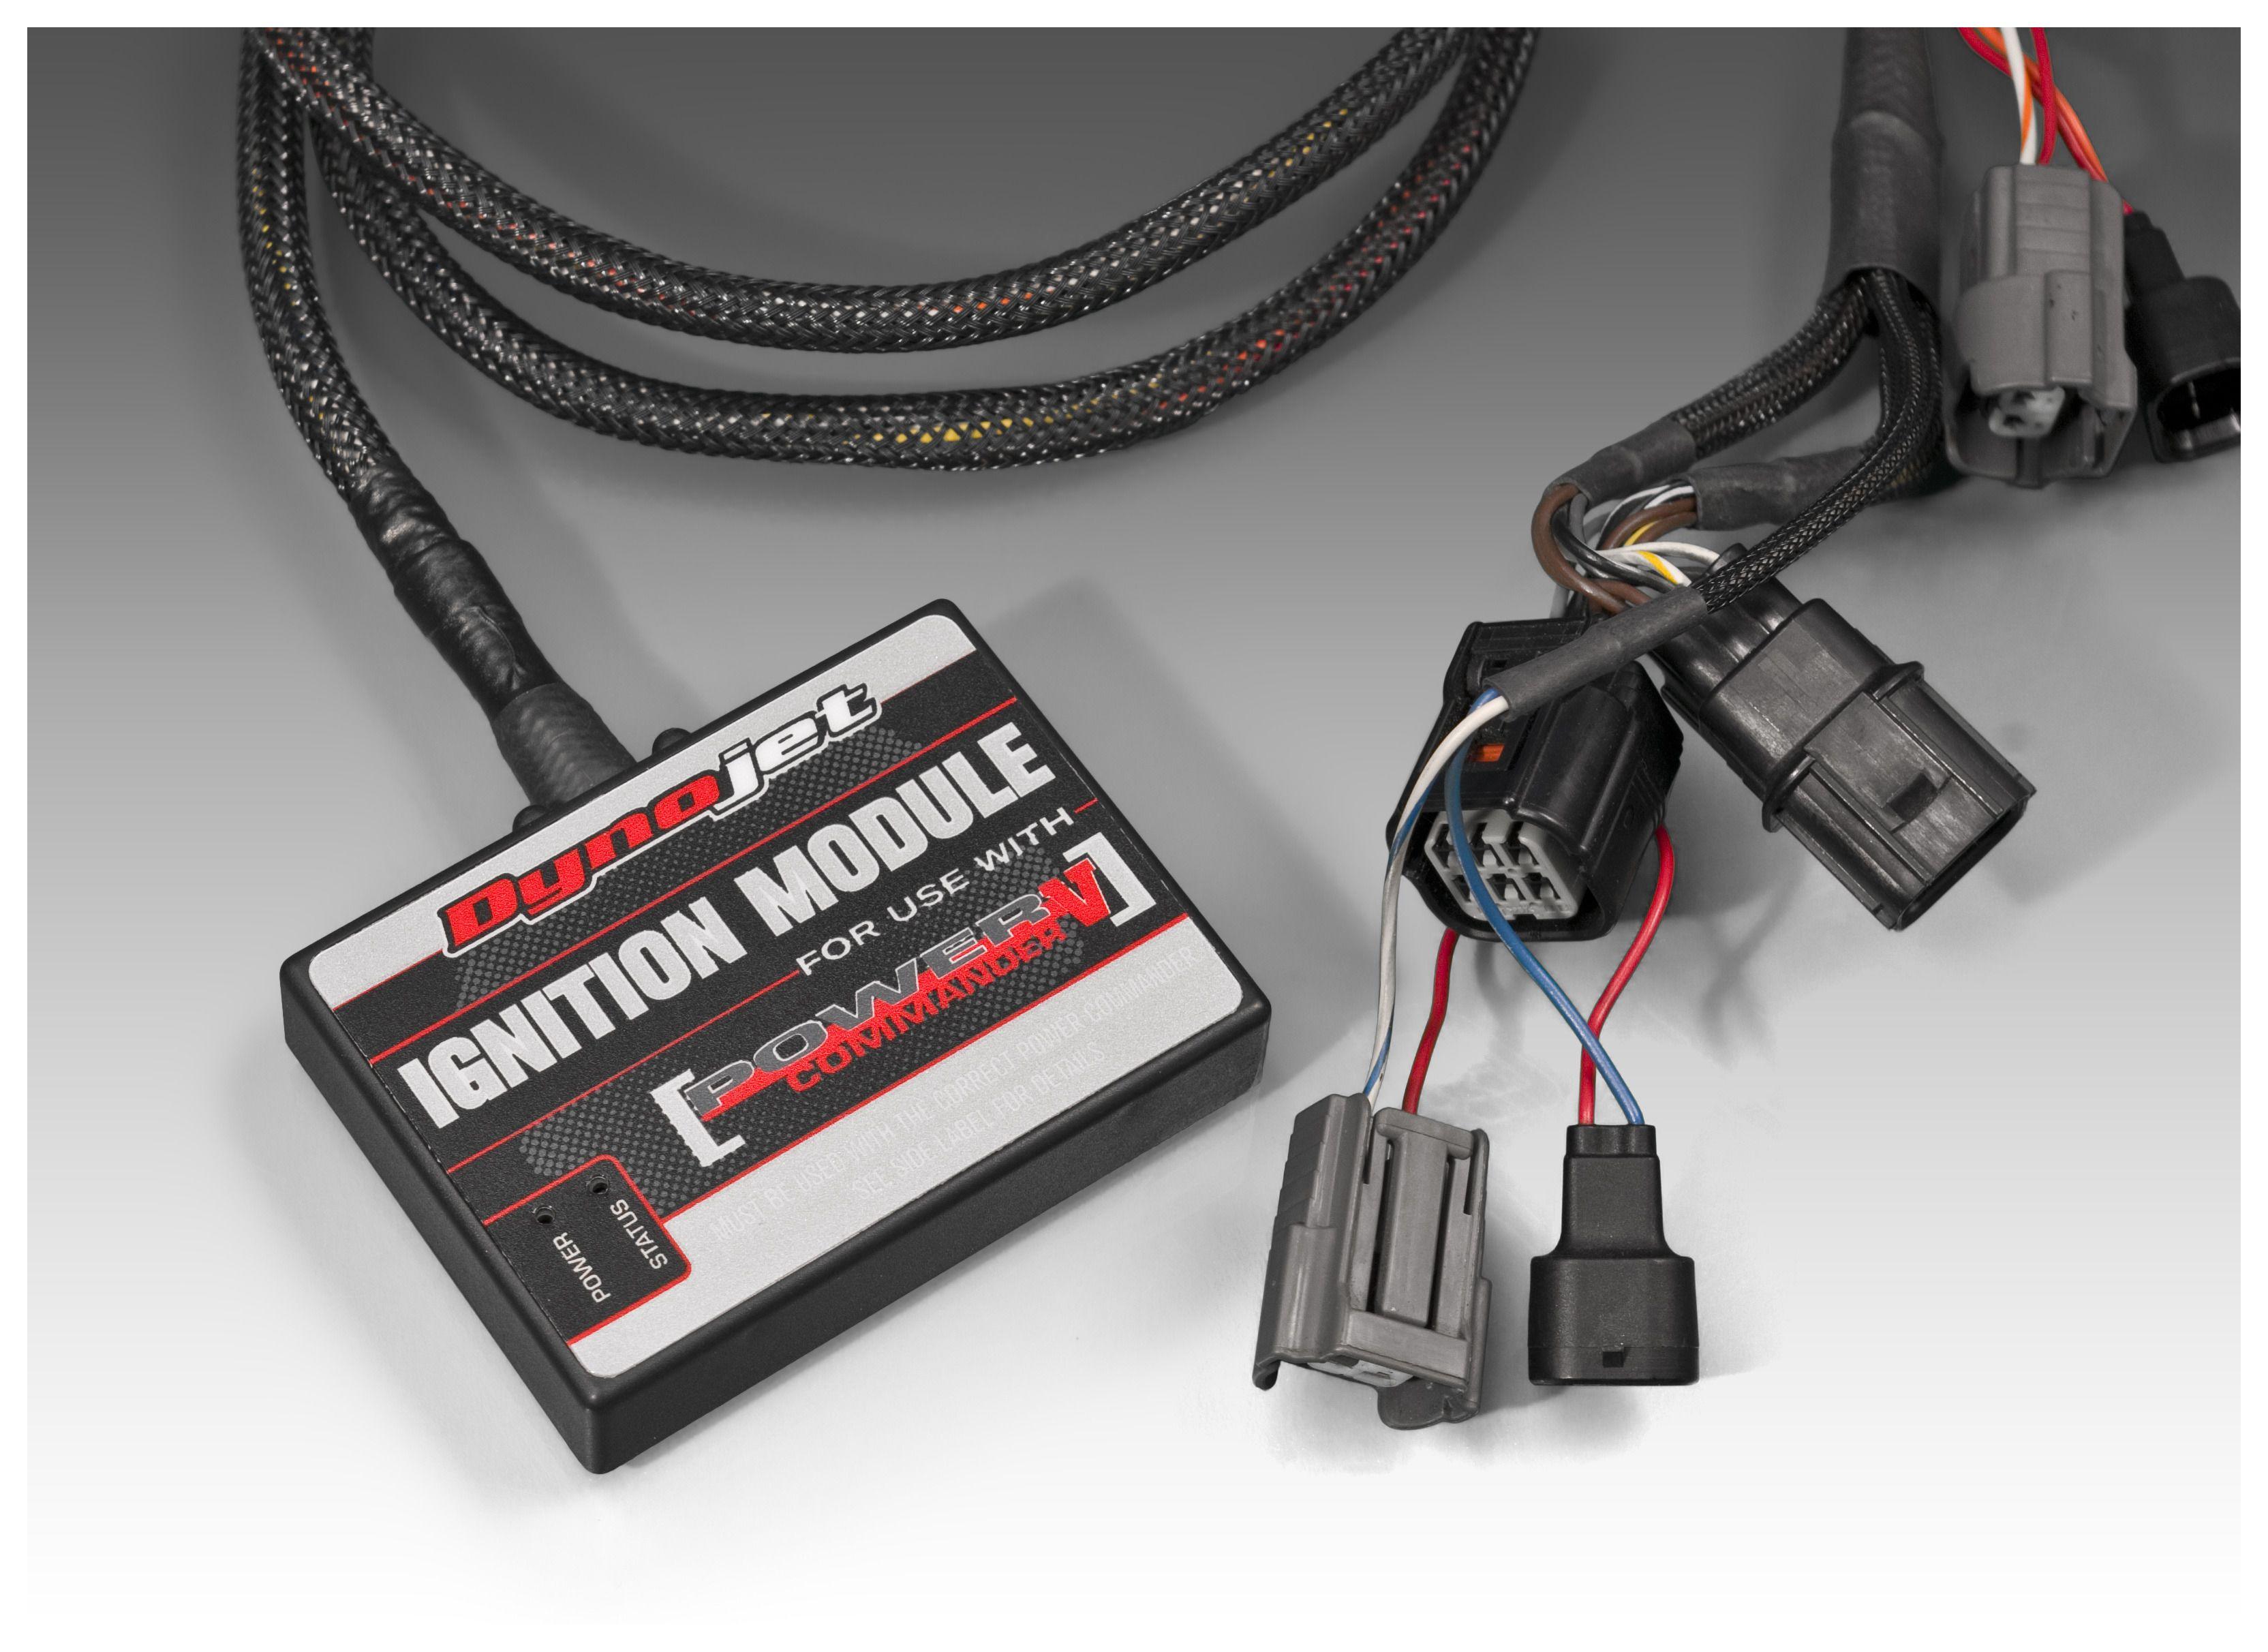 For Wireless Sensor Operation On 07 Yamaha R1 Wiring Diagram